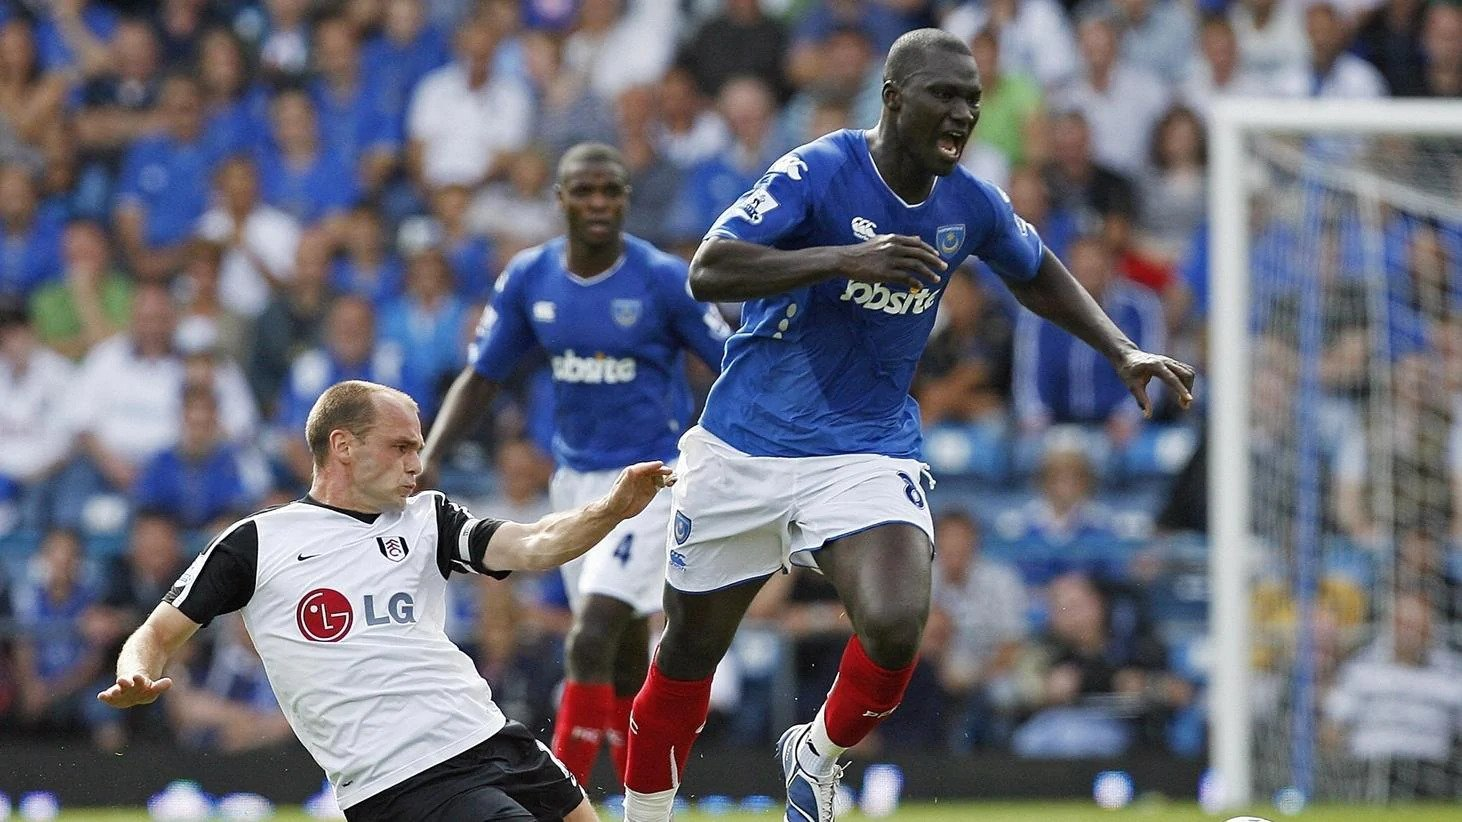 Former Fulham, Portsmouth, West Ham and Senegal international midfielder Papa Bouba Diop